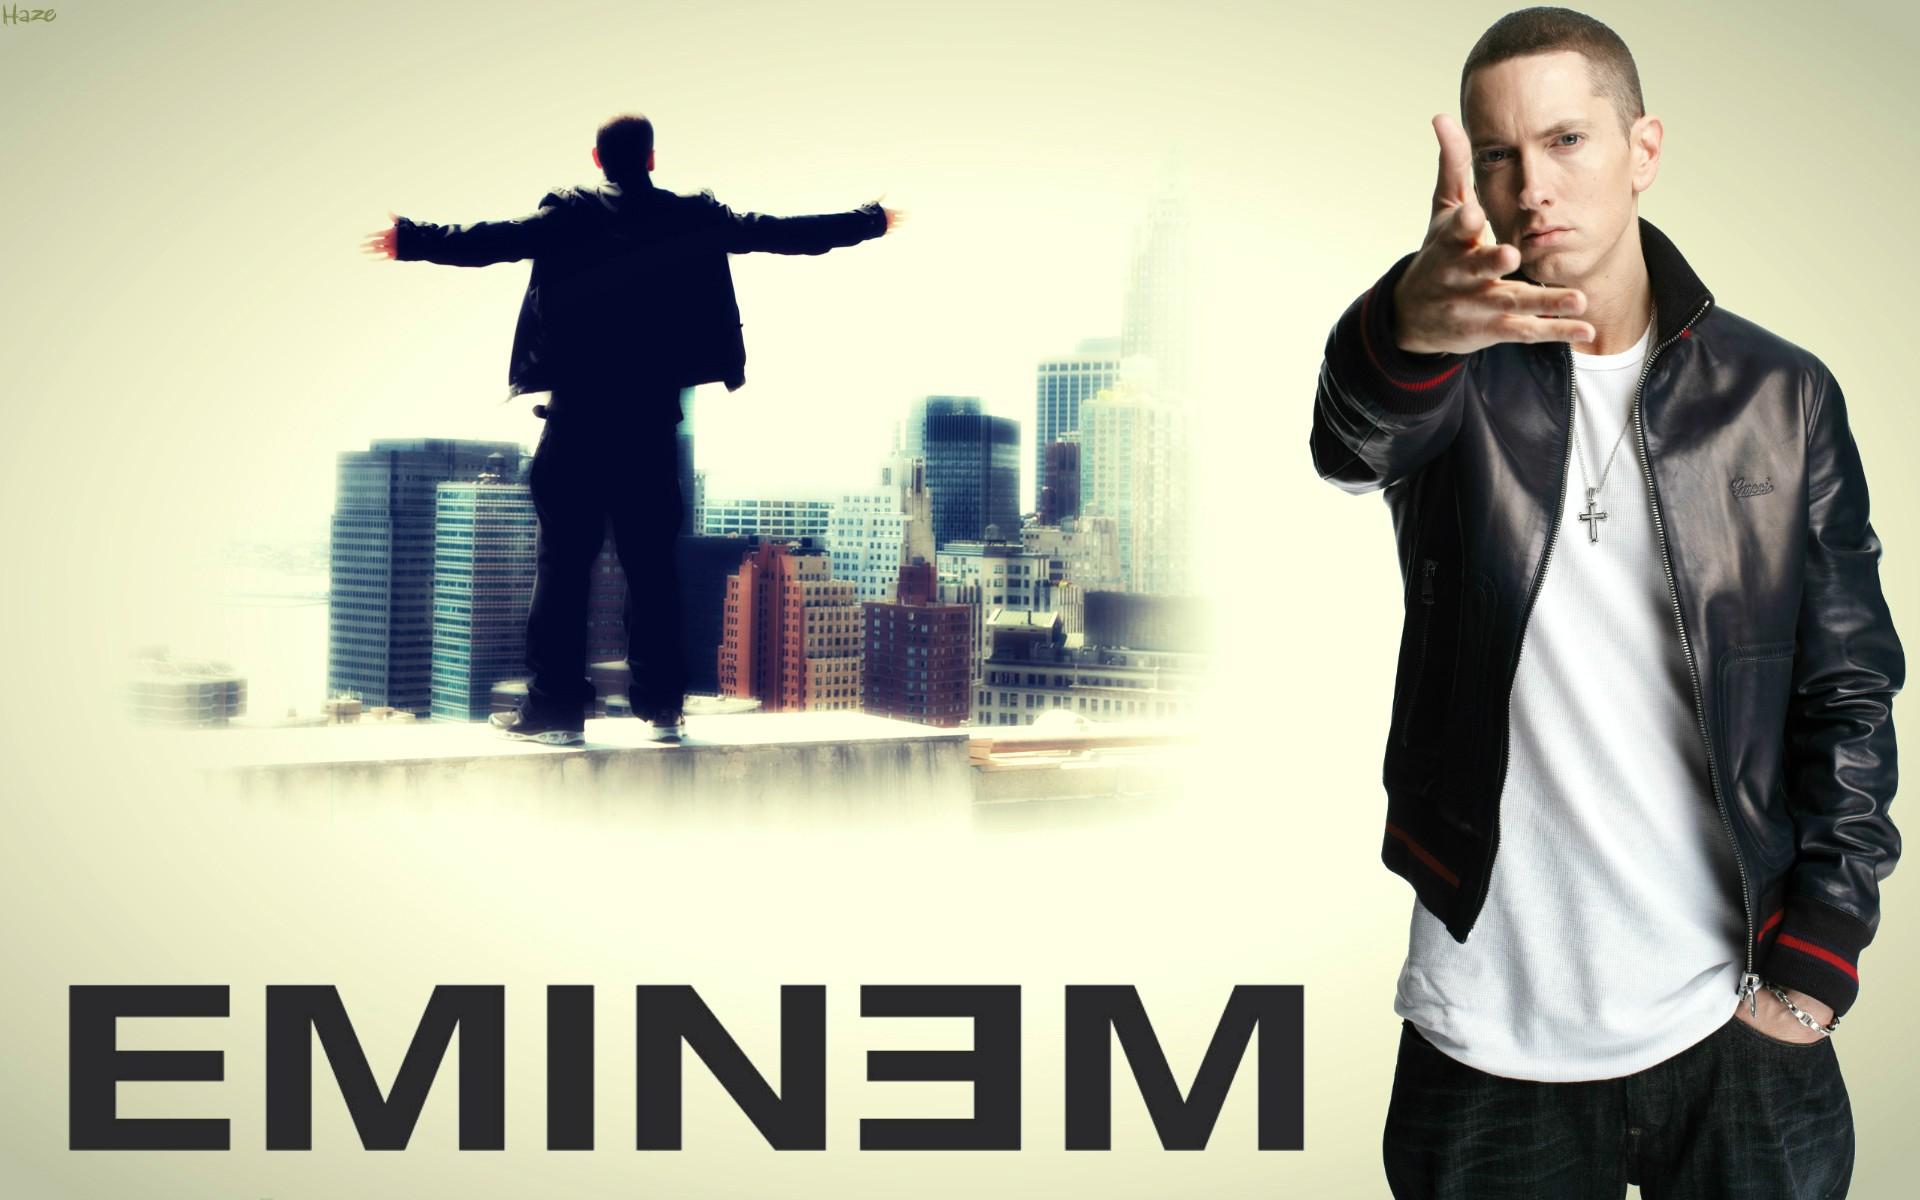 Eminem Wallpapers HD A36